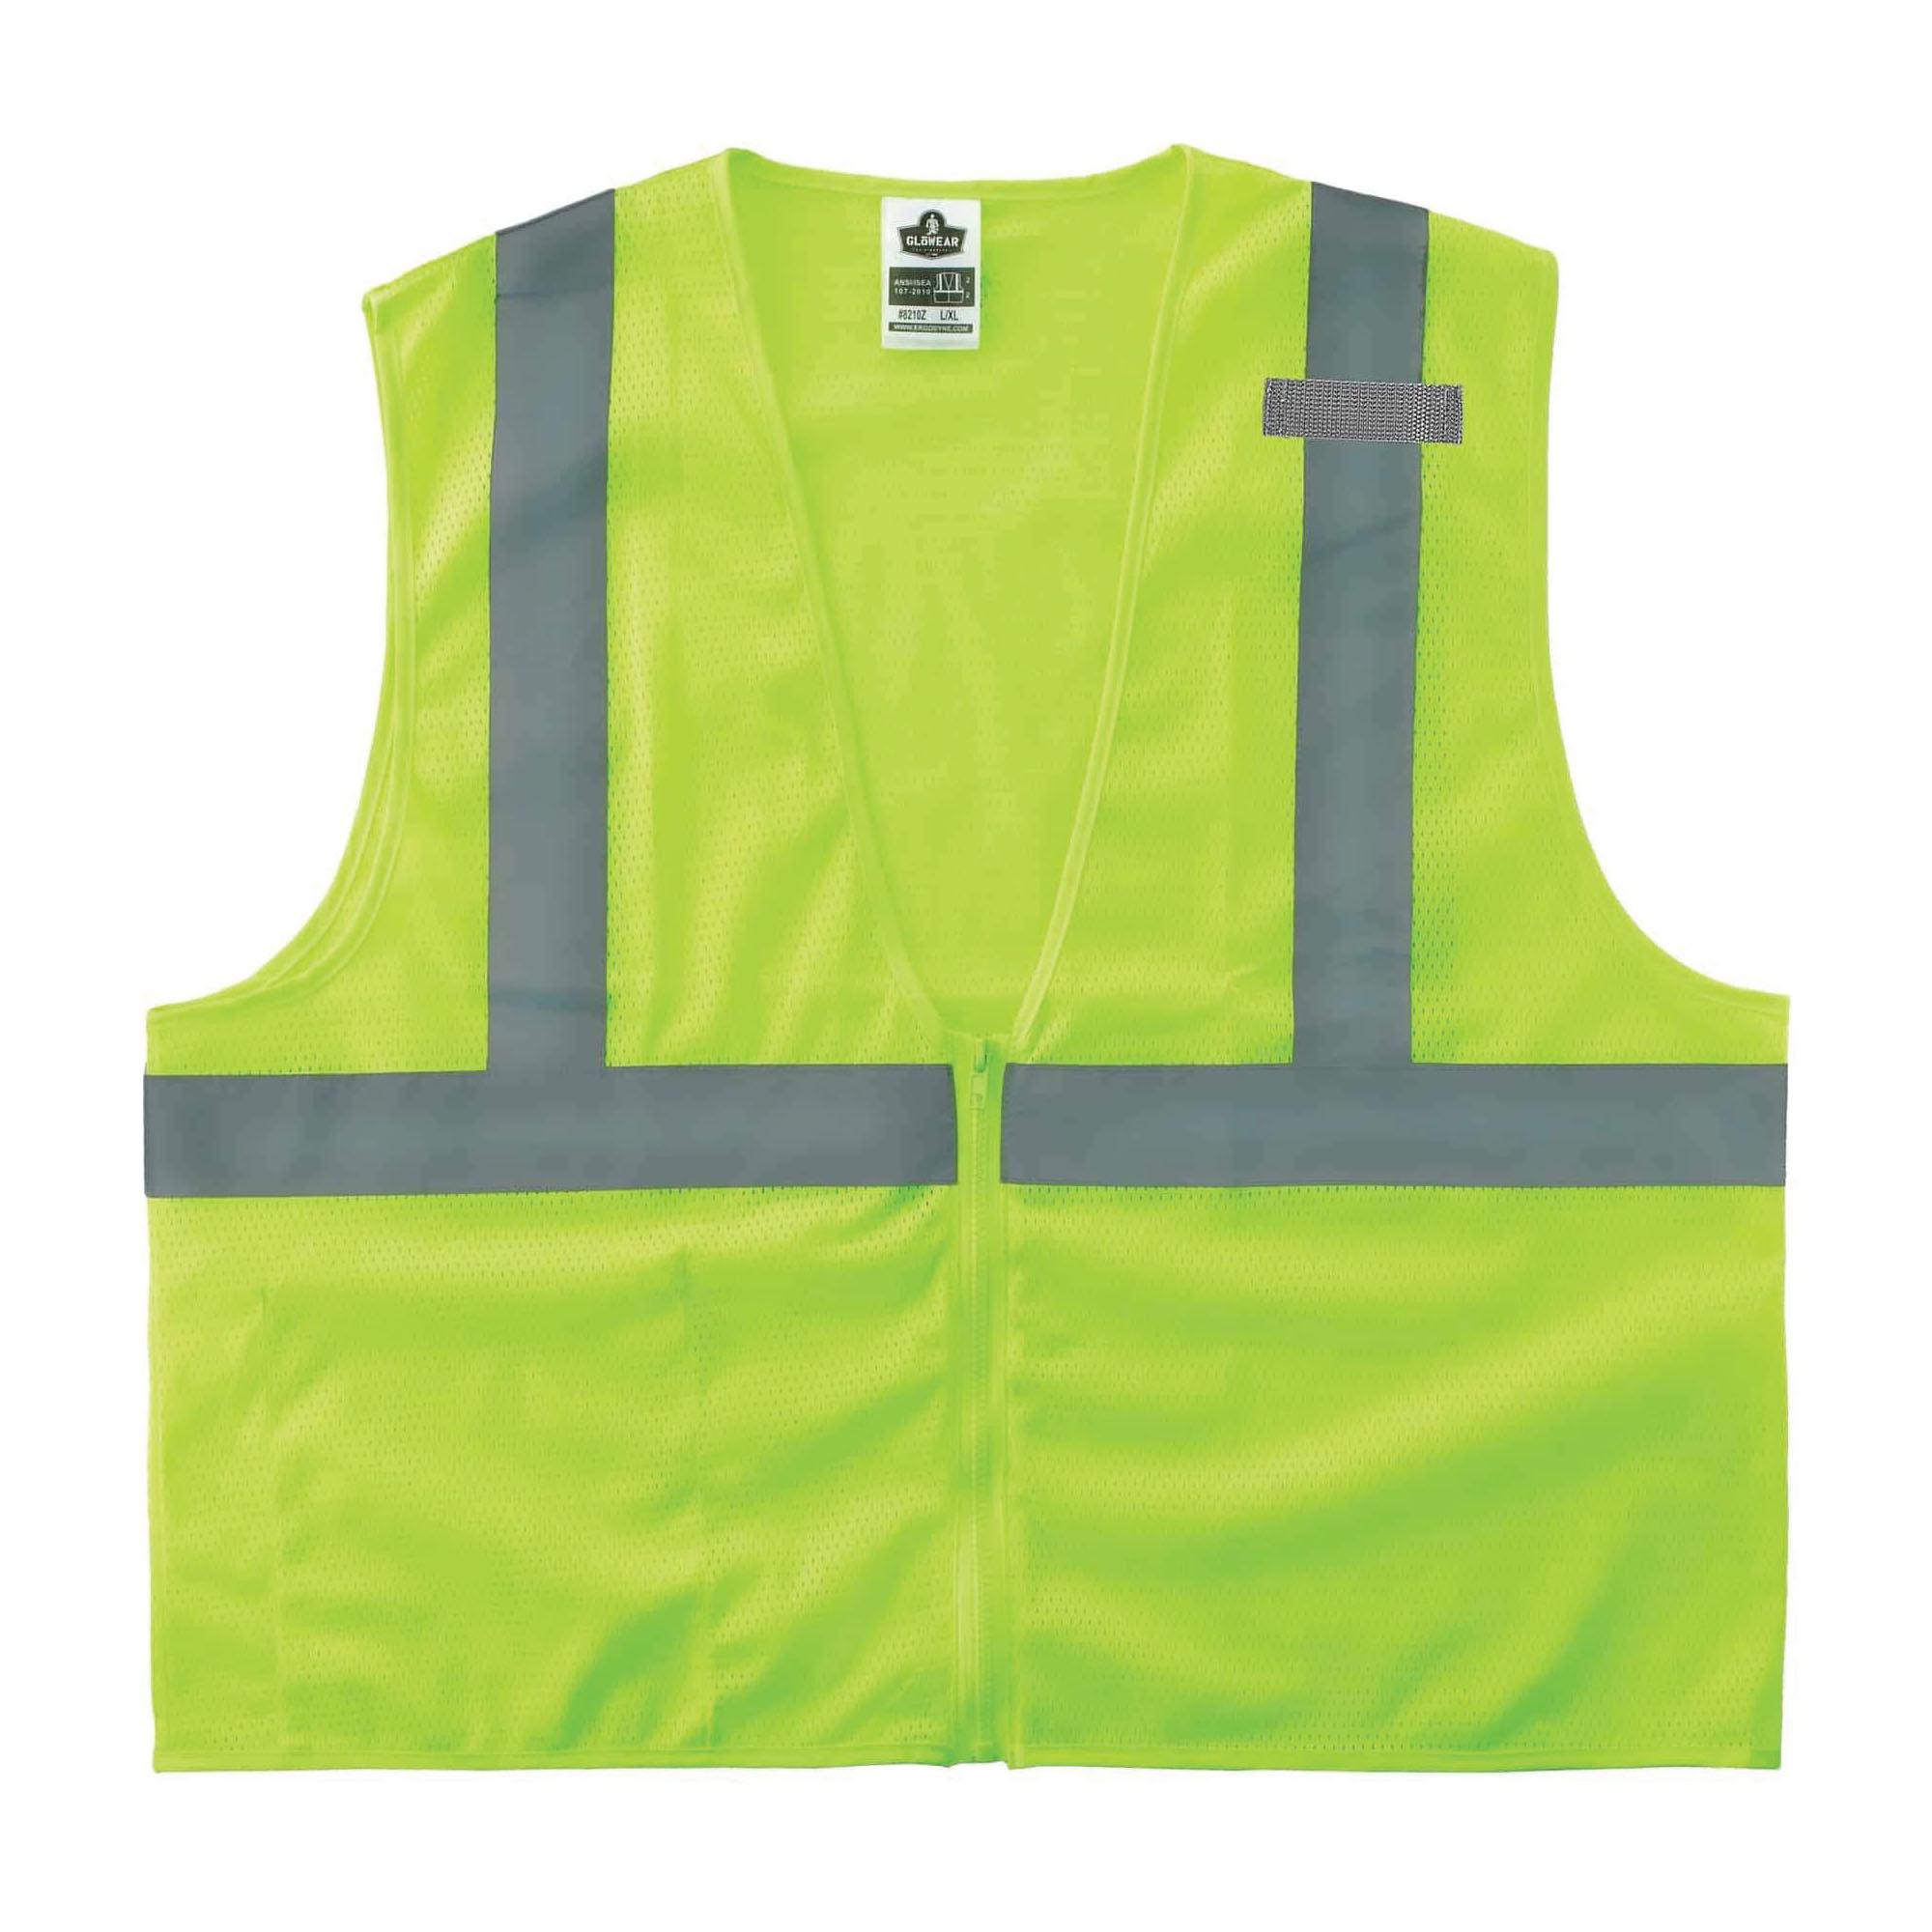 GloWear® 21043 8210Z Economy Standard Vest, S to M, Hi-Viz Orange, Polyester Mesh, Zipper Closure, 1 Pockets, ANSI Class: Class 2, ANSI/ISEA 107-2015 Type R